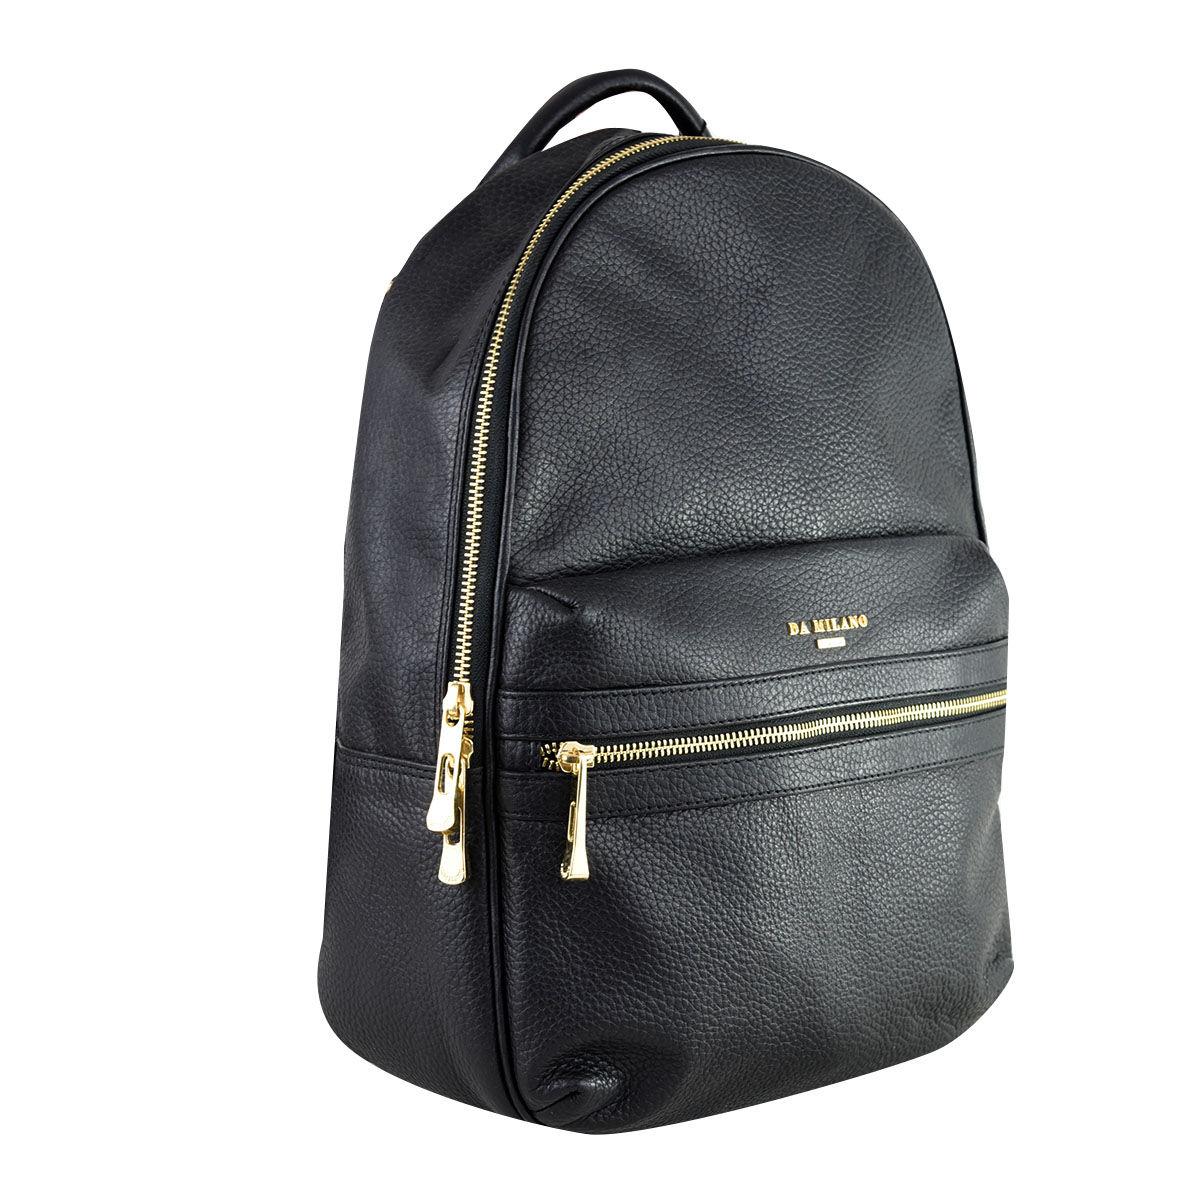 9c5508c107 Da Milano Unisex Rcb-0309 Black Wax Laptop Backpack